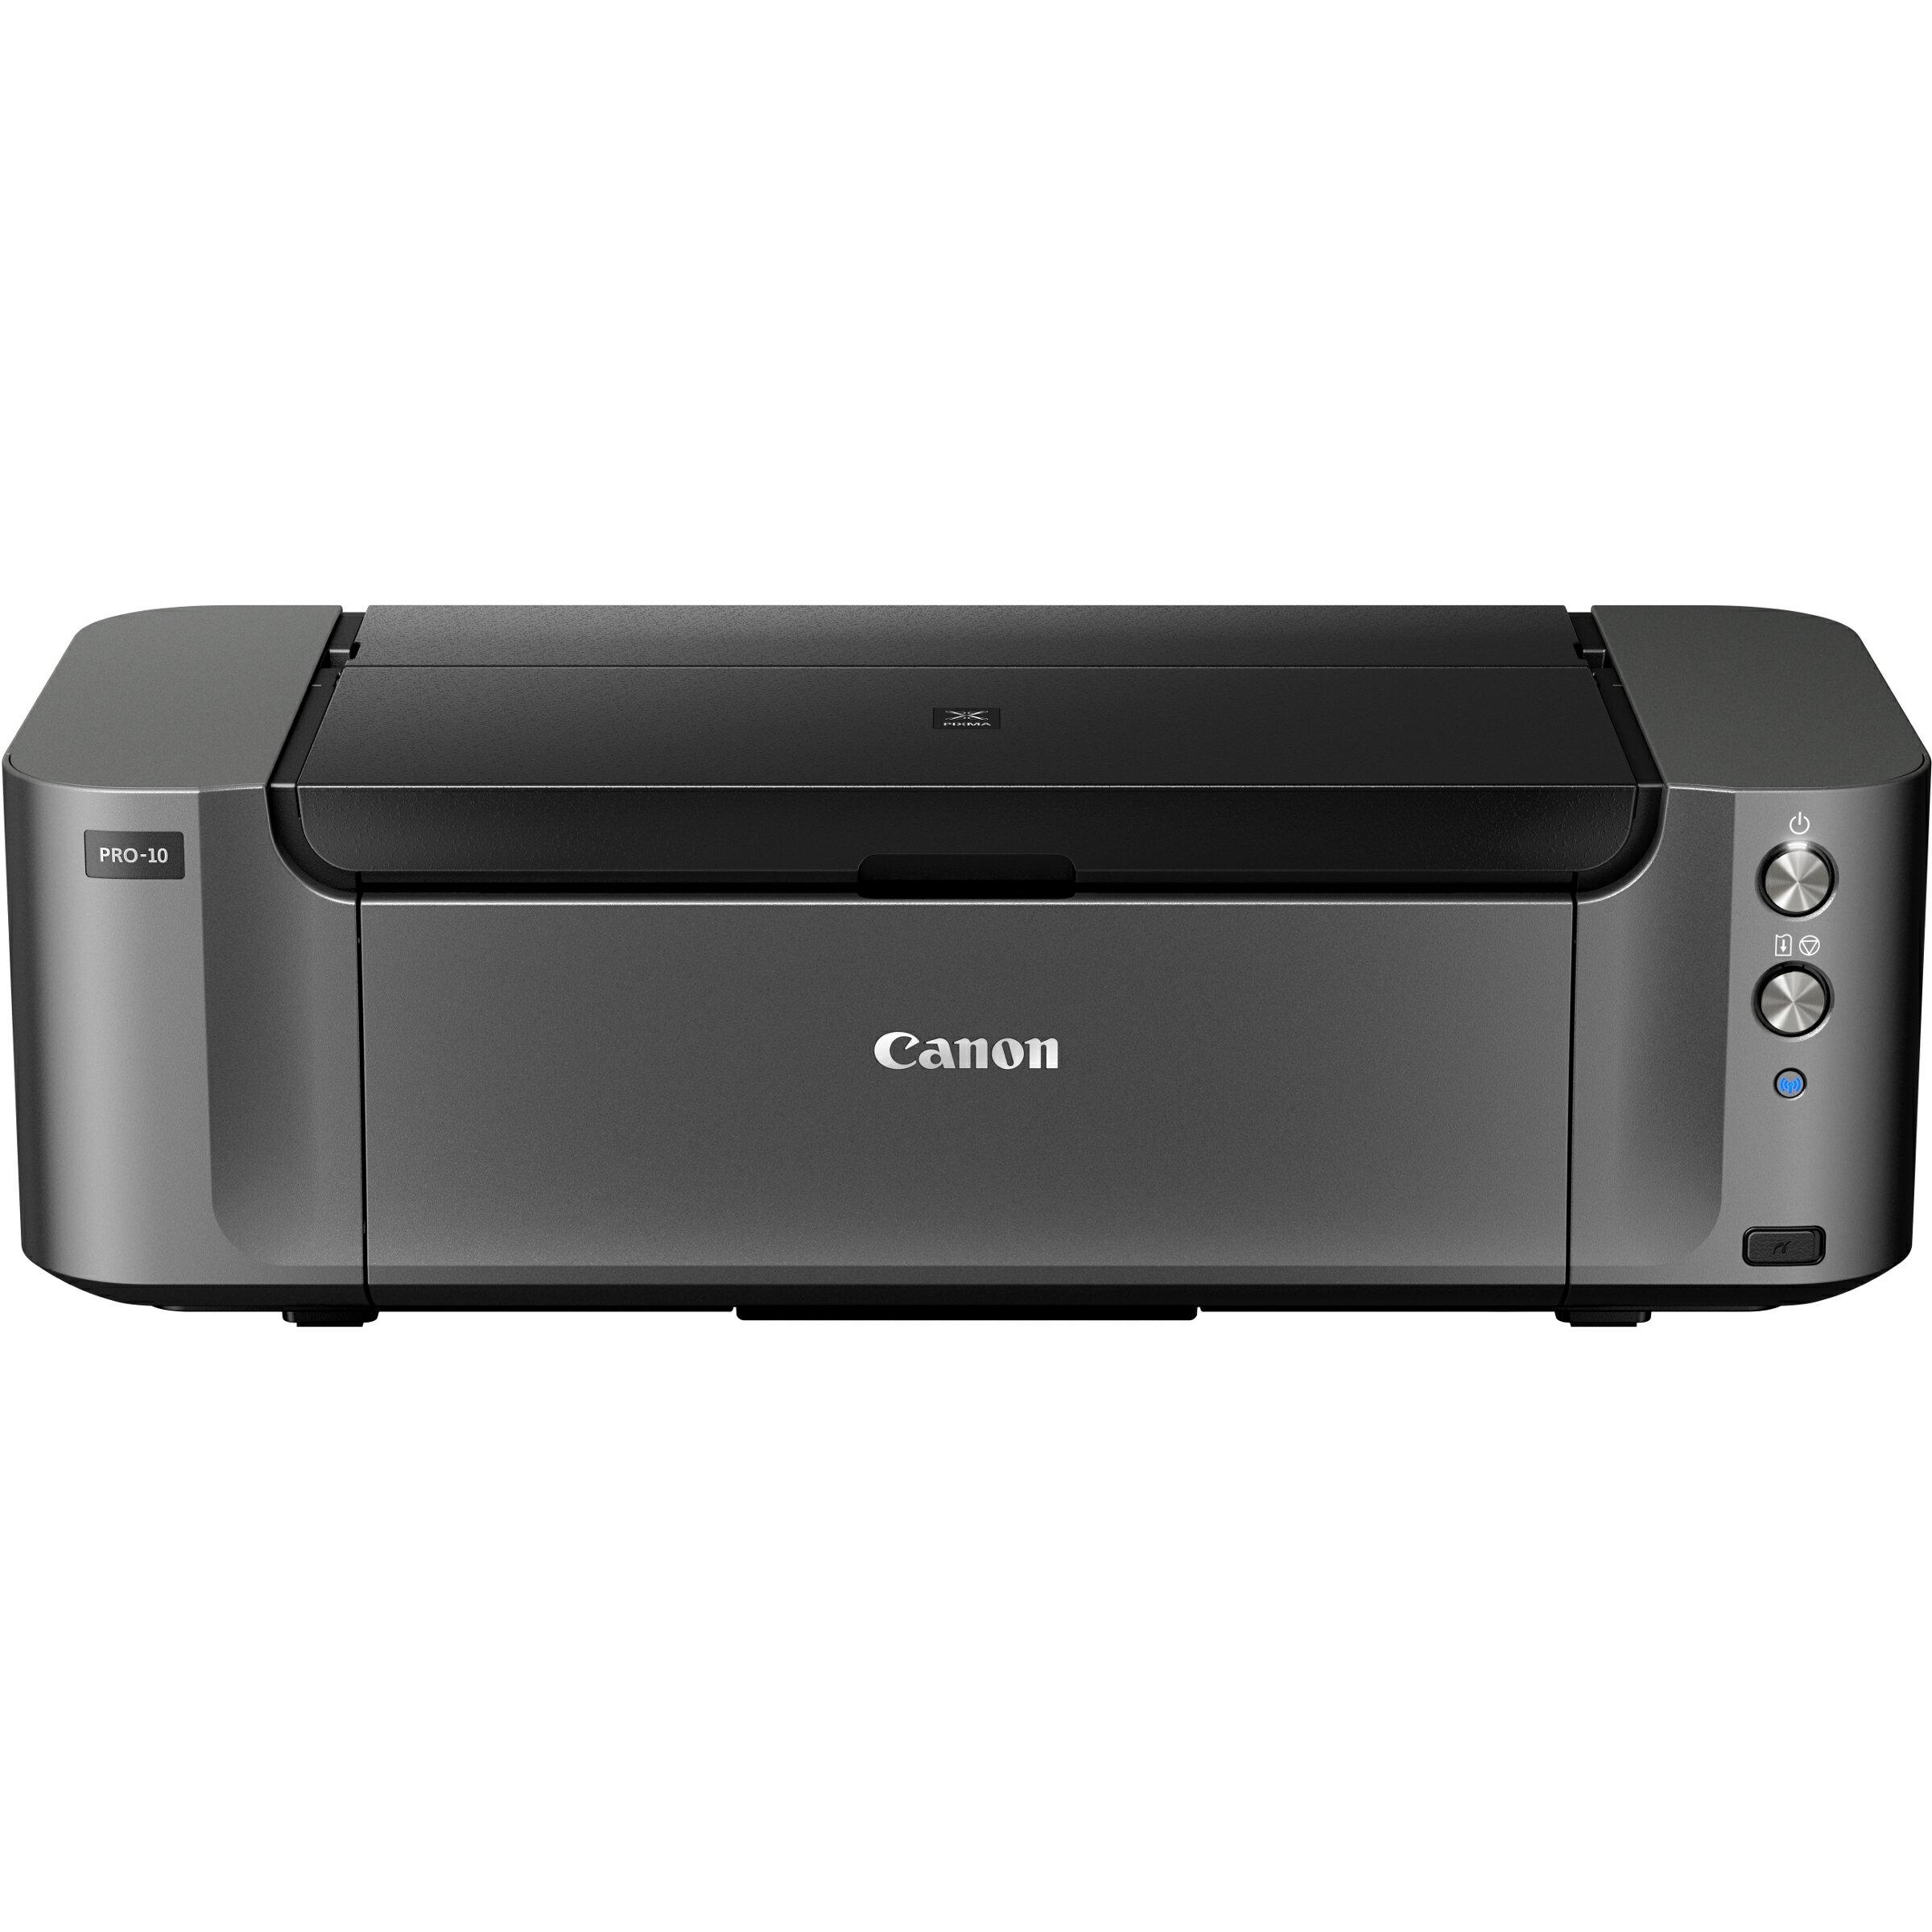 Canon PIXMA Pro PRO-10 Inkjet Printer - Color - 4800 x 2400 dpi Print - Photo/Disc Print - Desktop - 3.6 Second Photo - 150 sheets Standard Input Capacity - Ethernet - Wireless LAN - USB - PictBridge 0